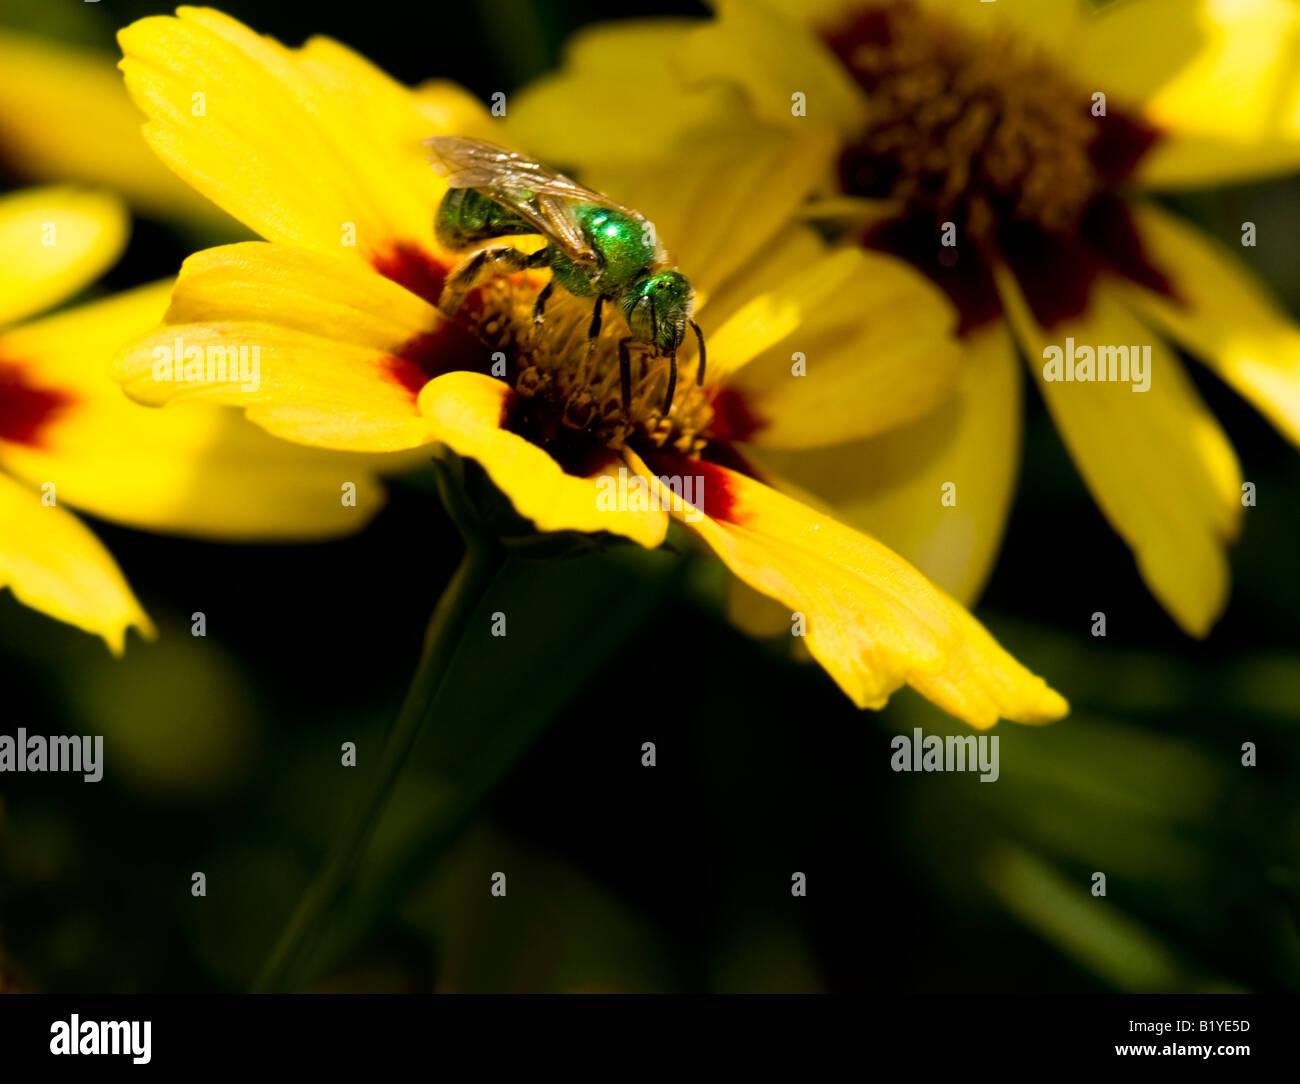 Augochloropsis metallica, a small metallic green bee on a coreopsis flower in Oklahoma, USA. - Stock Image